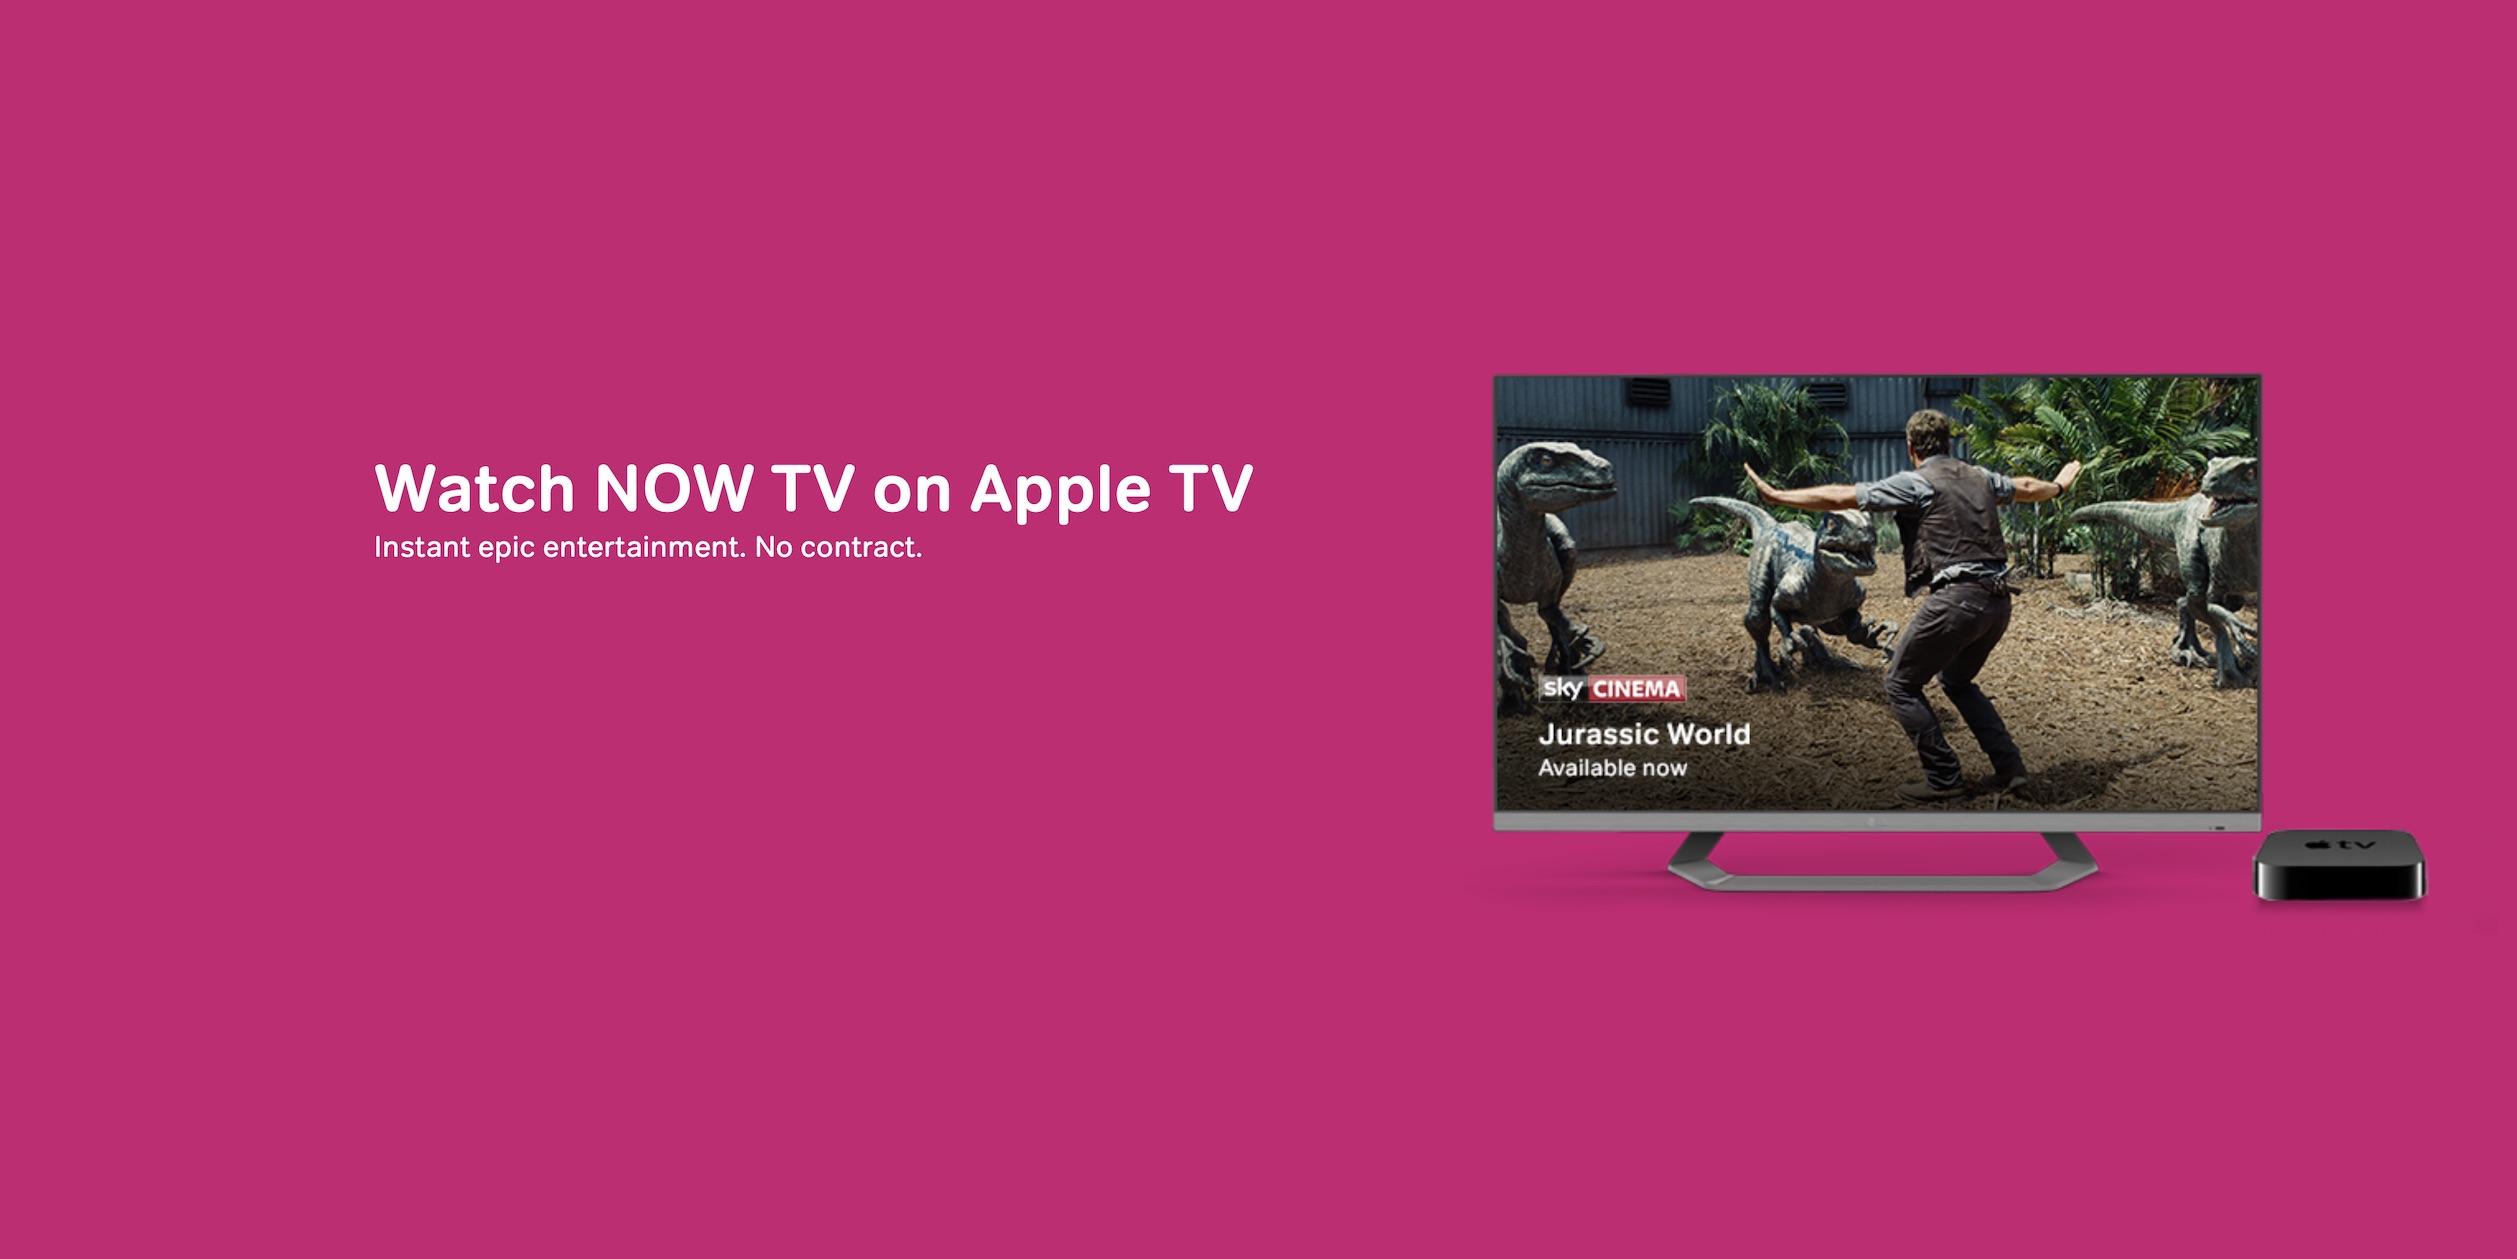 uk streaming service now tv testing new tvos app for apple tv